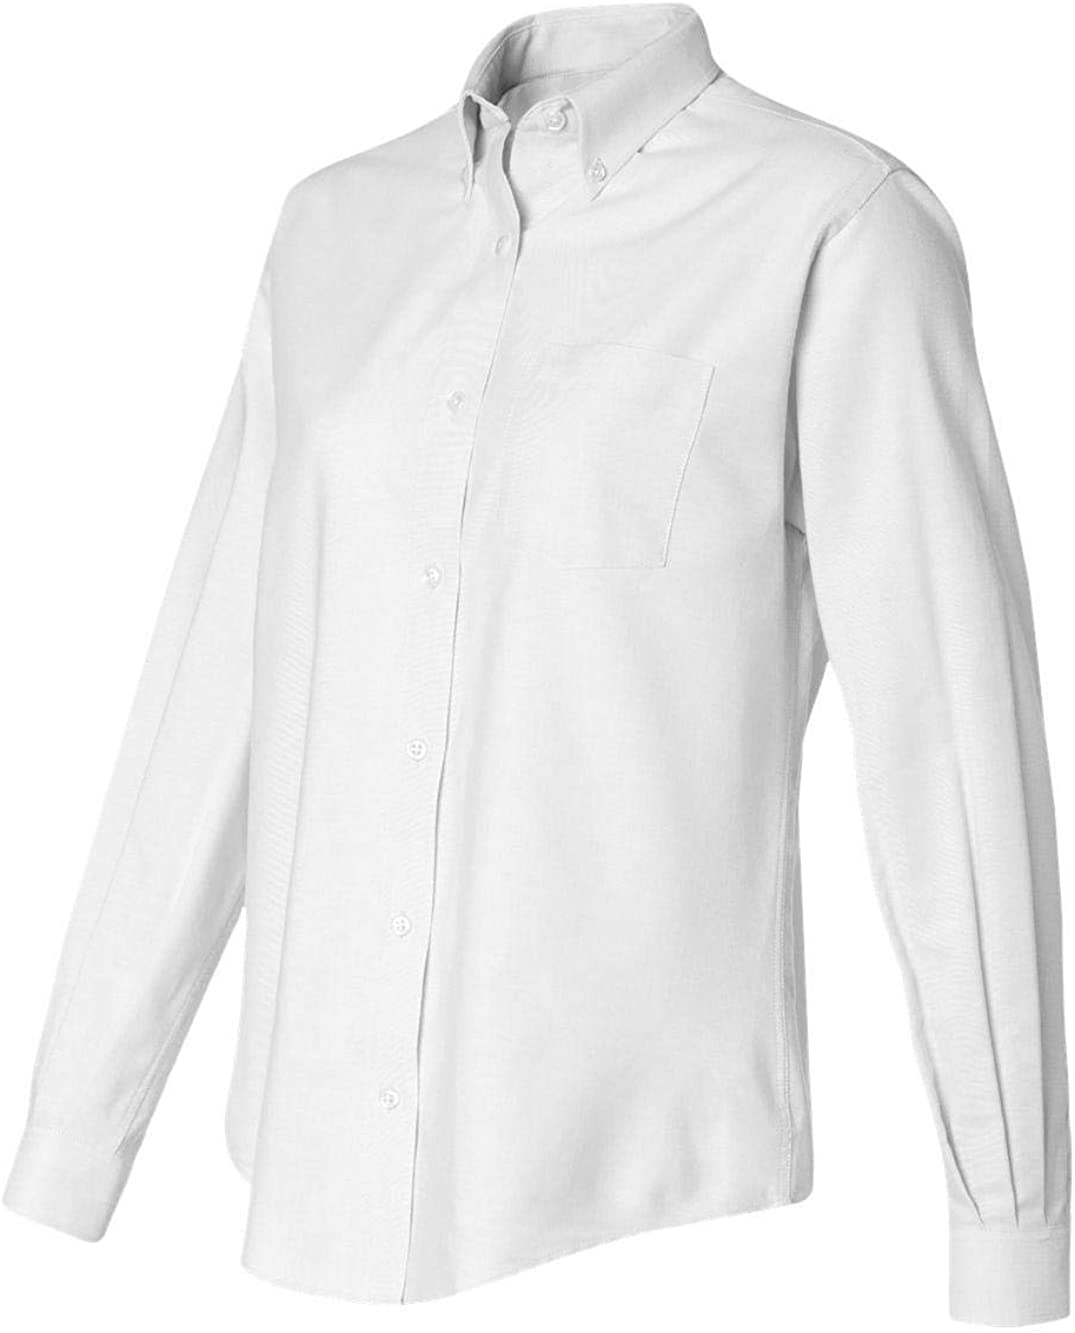 Van Heusen Women's Oxford Shirt - 13V0002